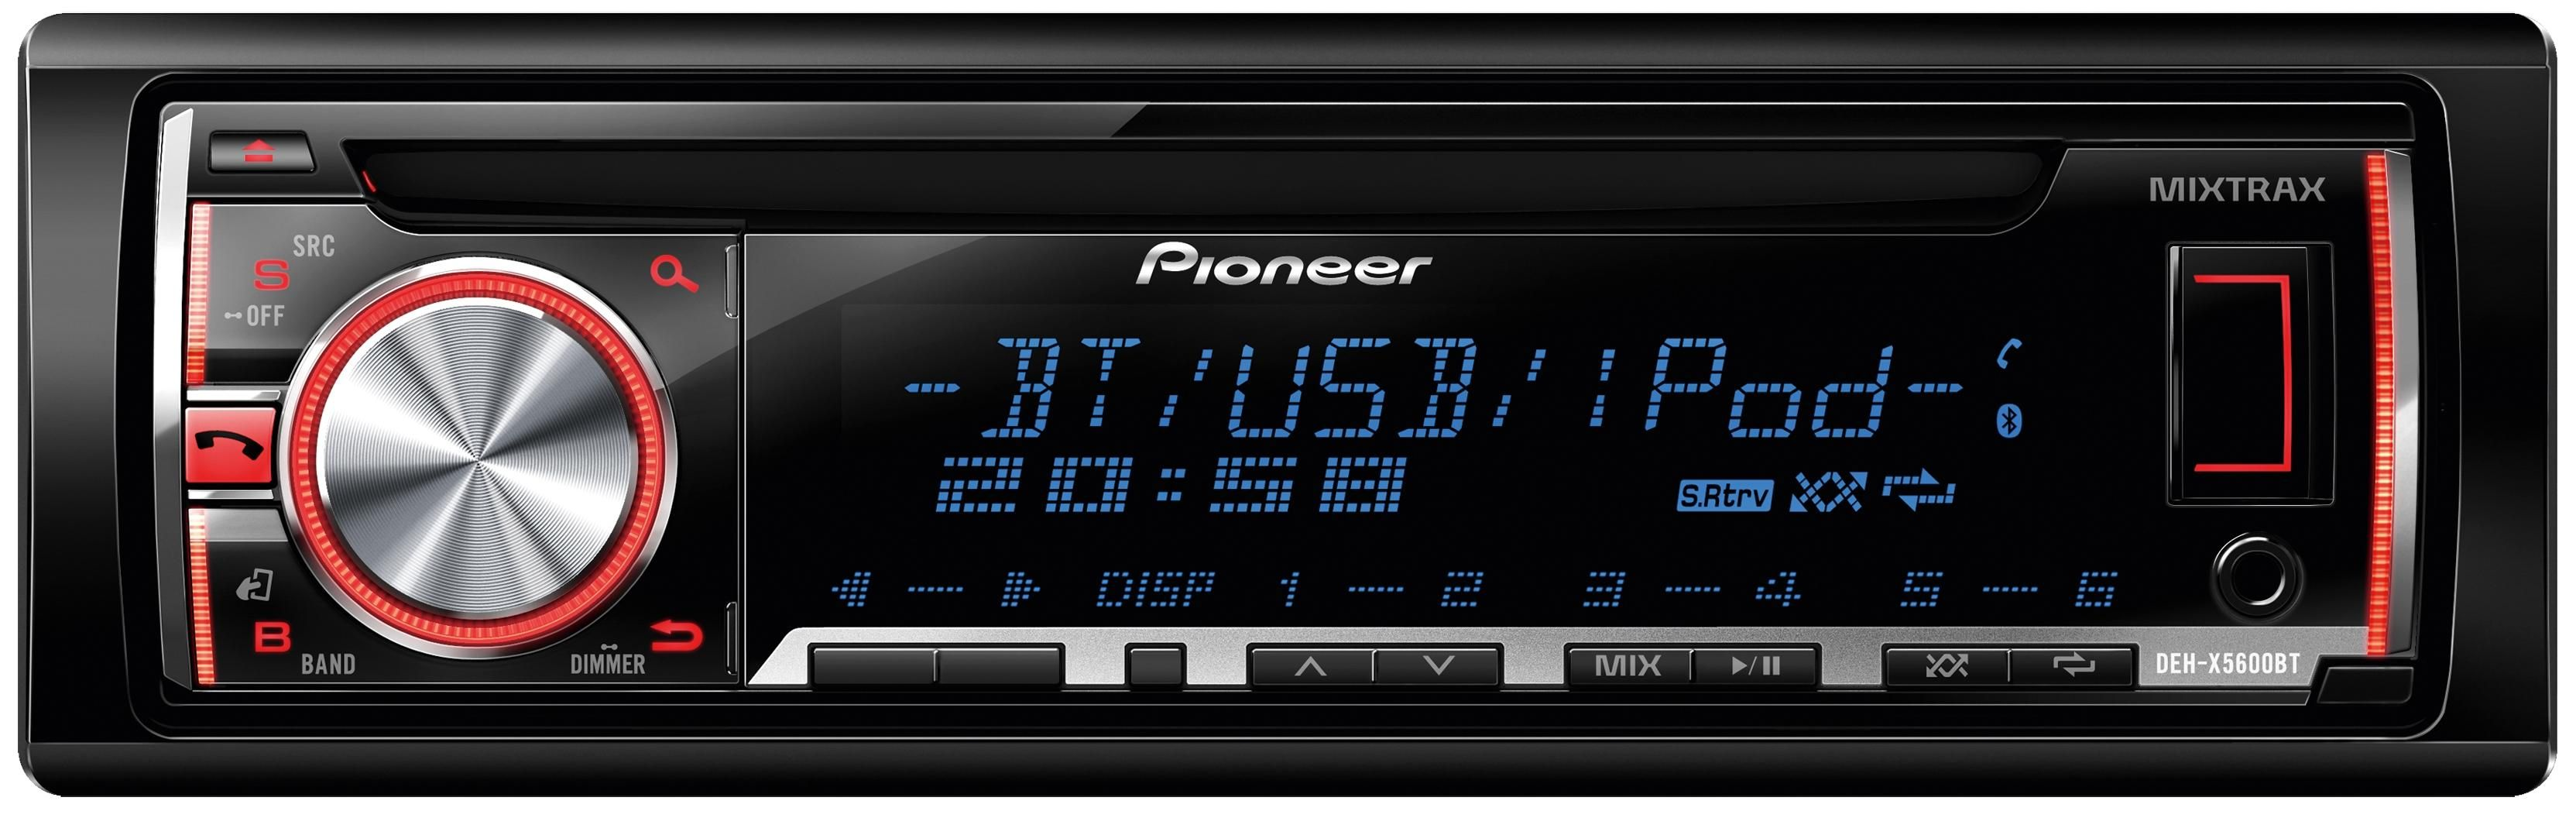 Pioneer Deh X5600bt Car Stereo With Bluetooth Car Stereo Bluetooth Car Stereo Car Usb